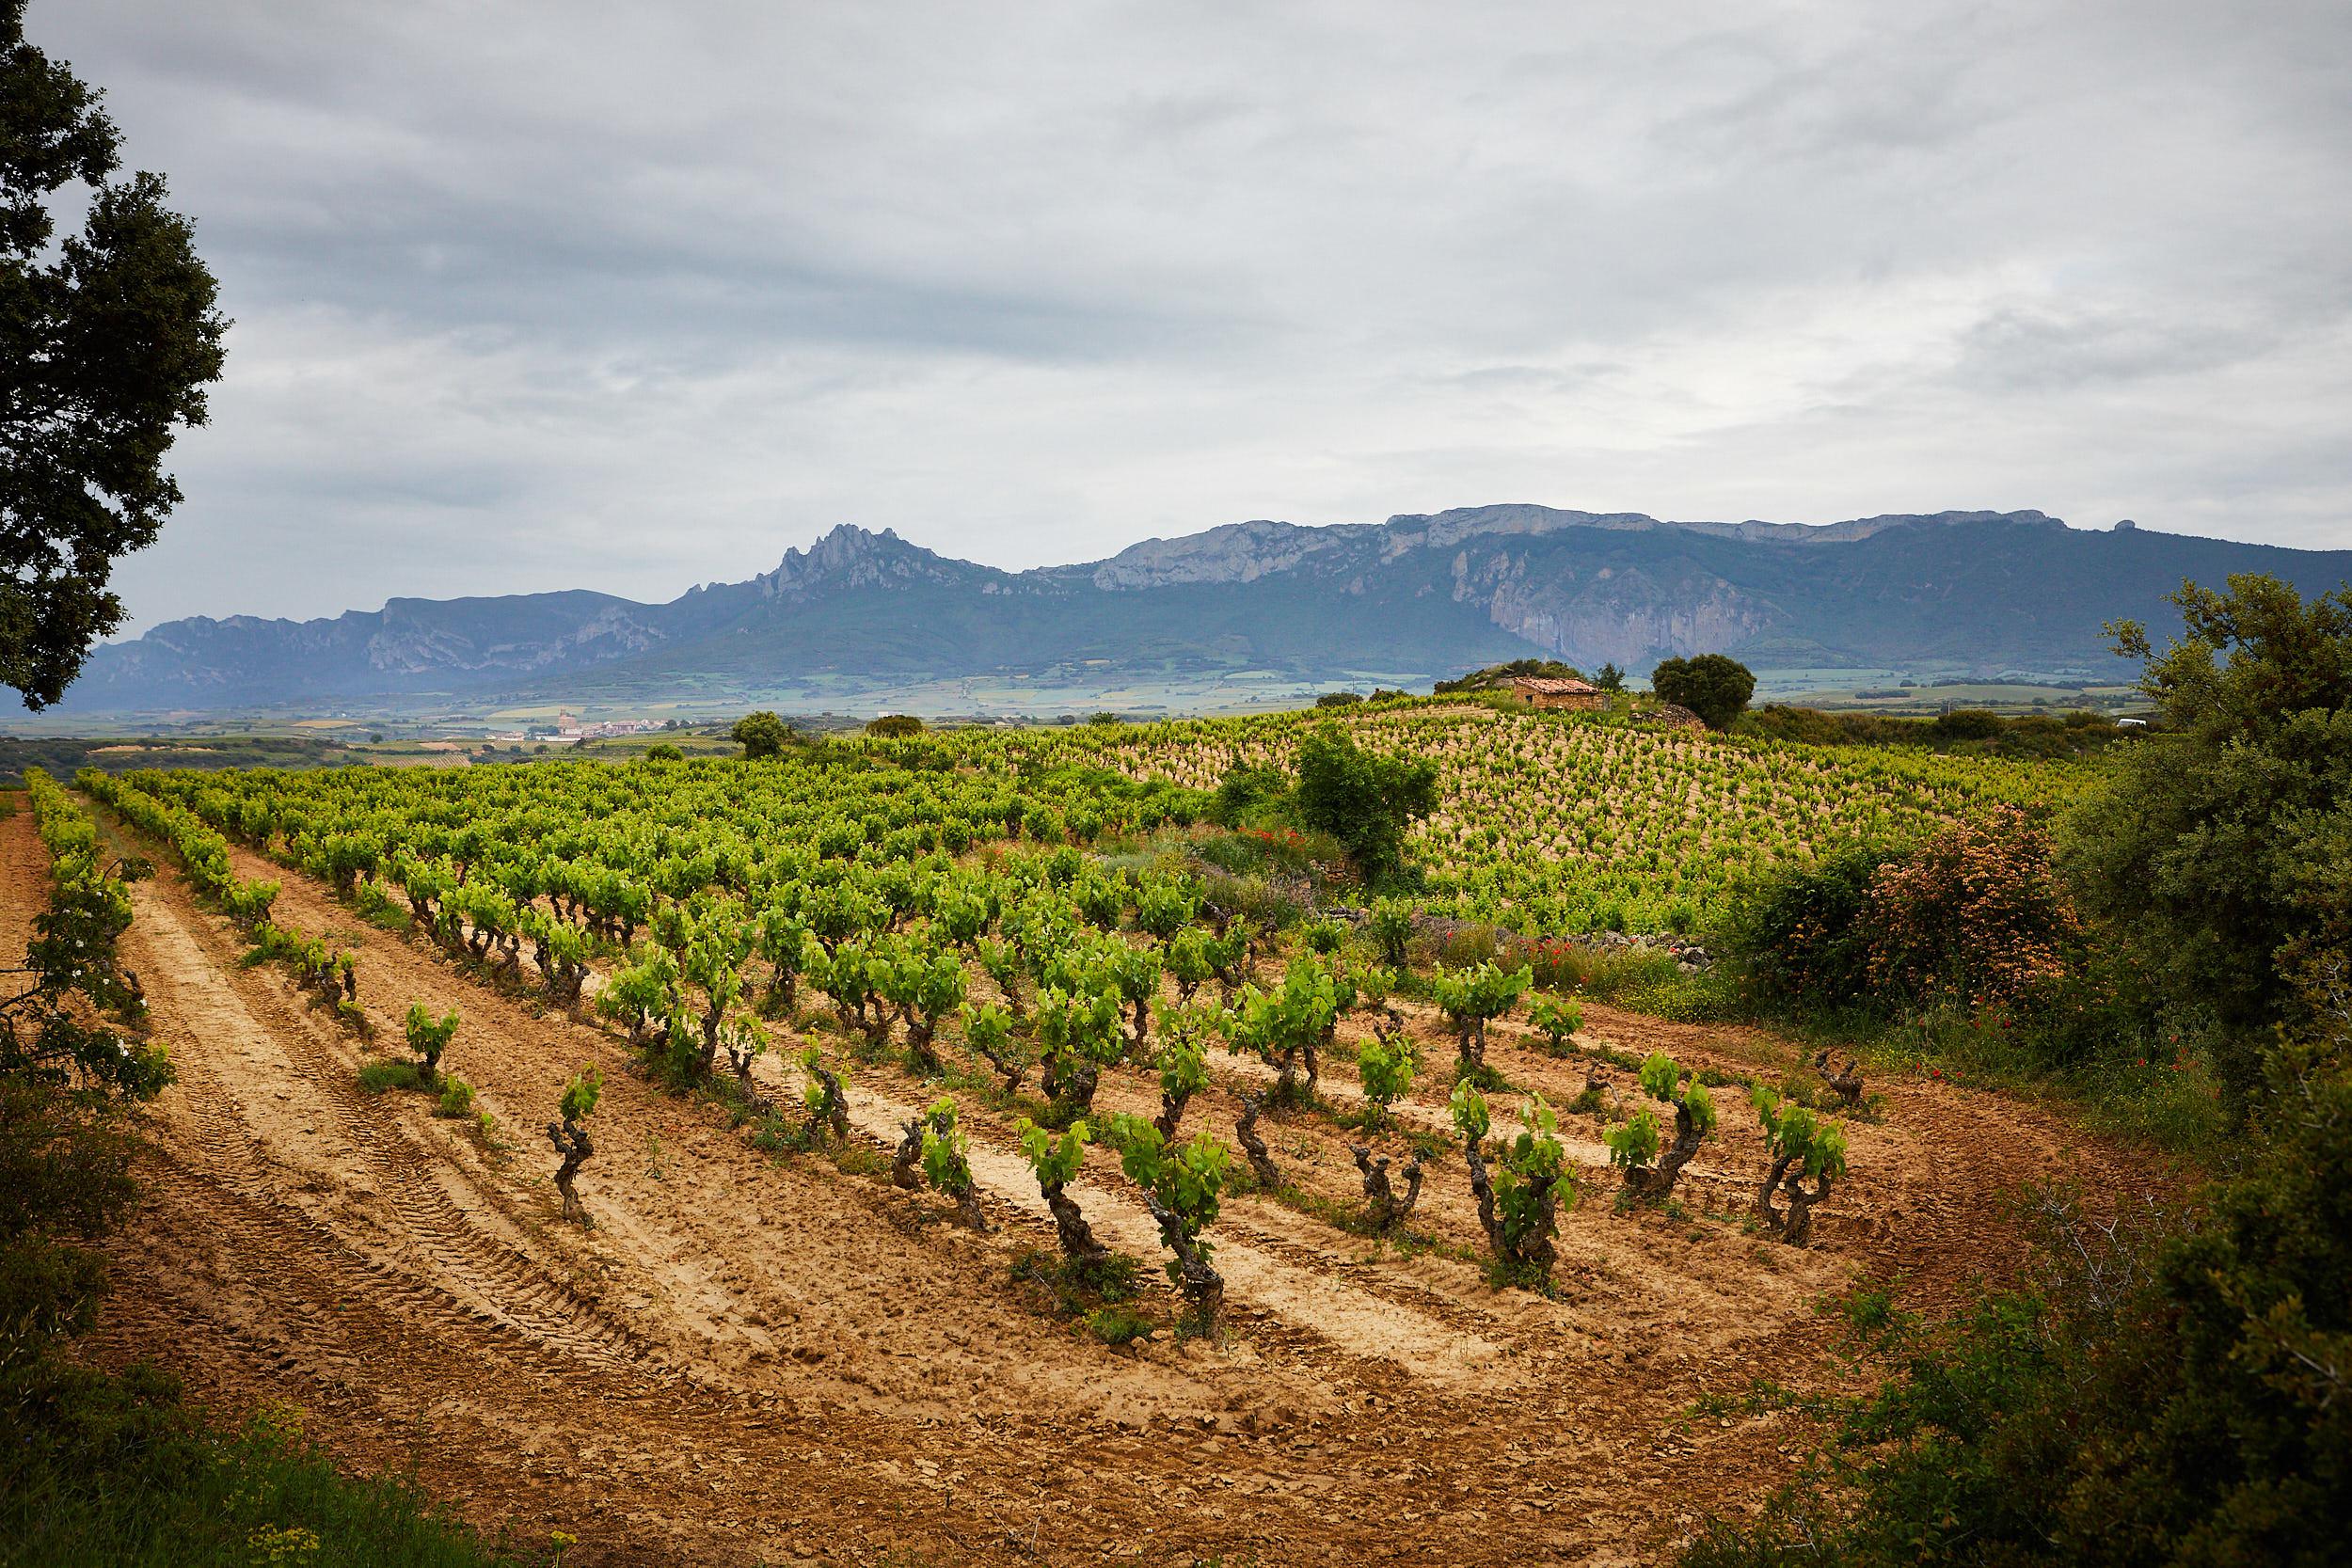 1806Commercial-professional-wine-photography-la-rioja-spain-James-Sturcke_0026.jpg